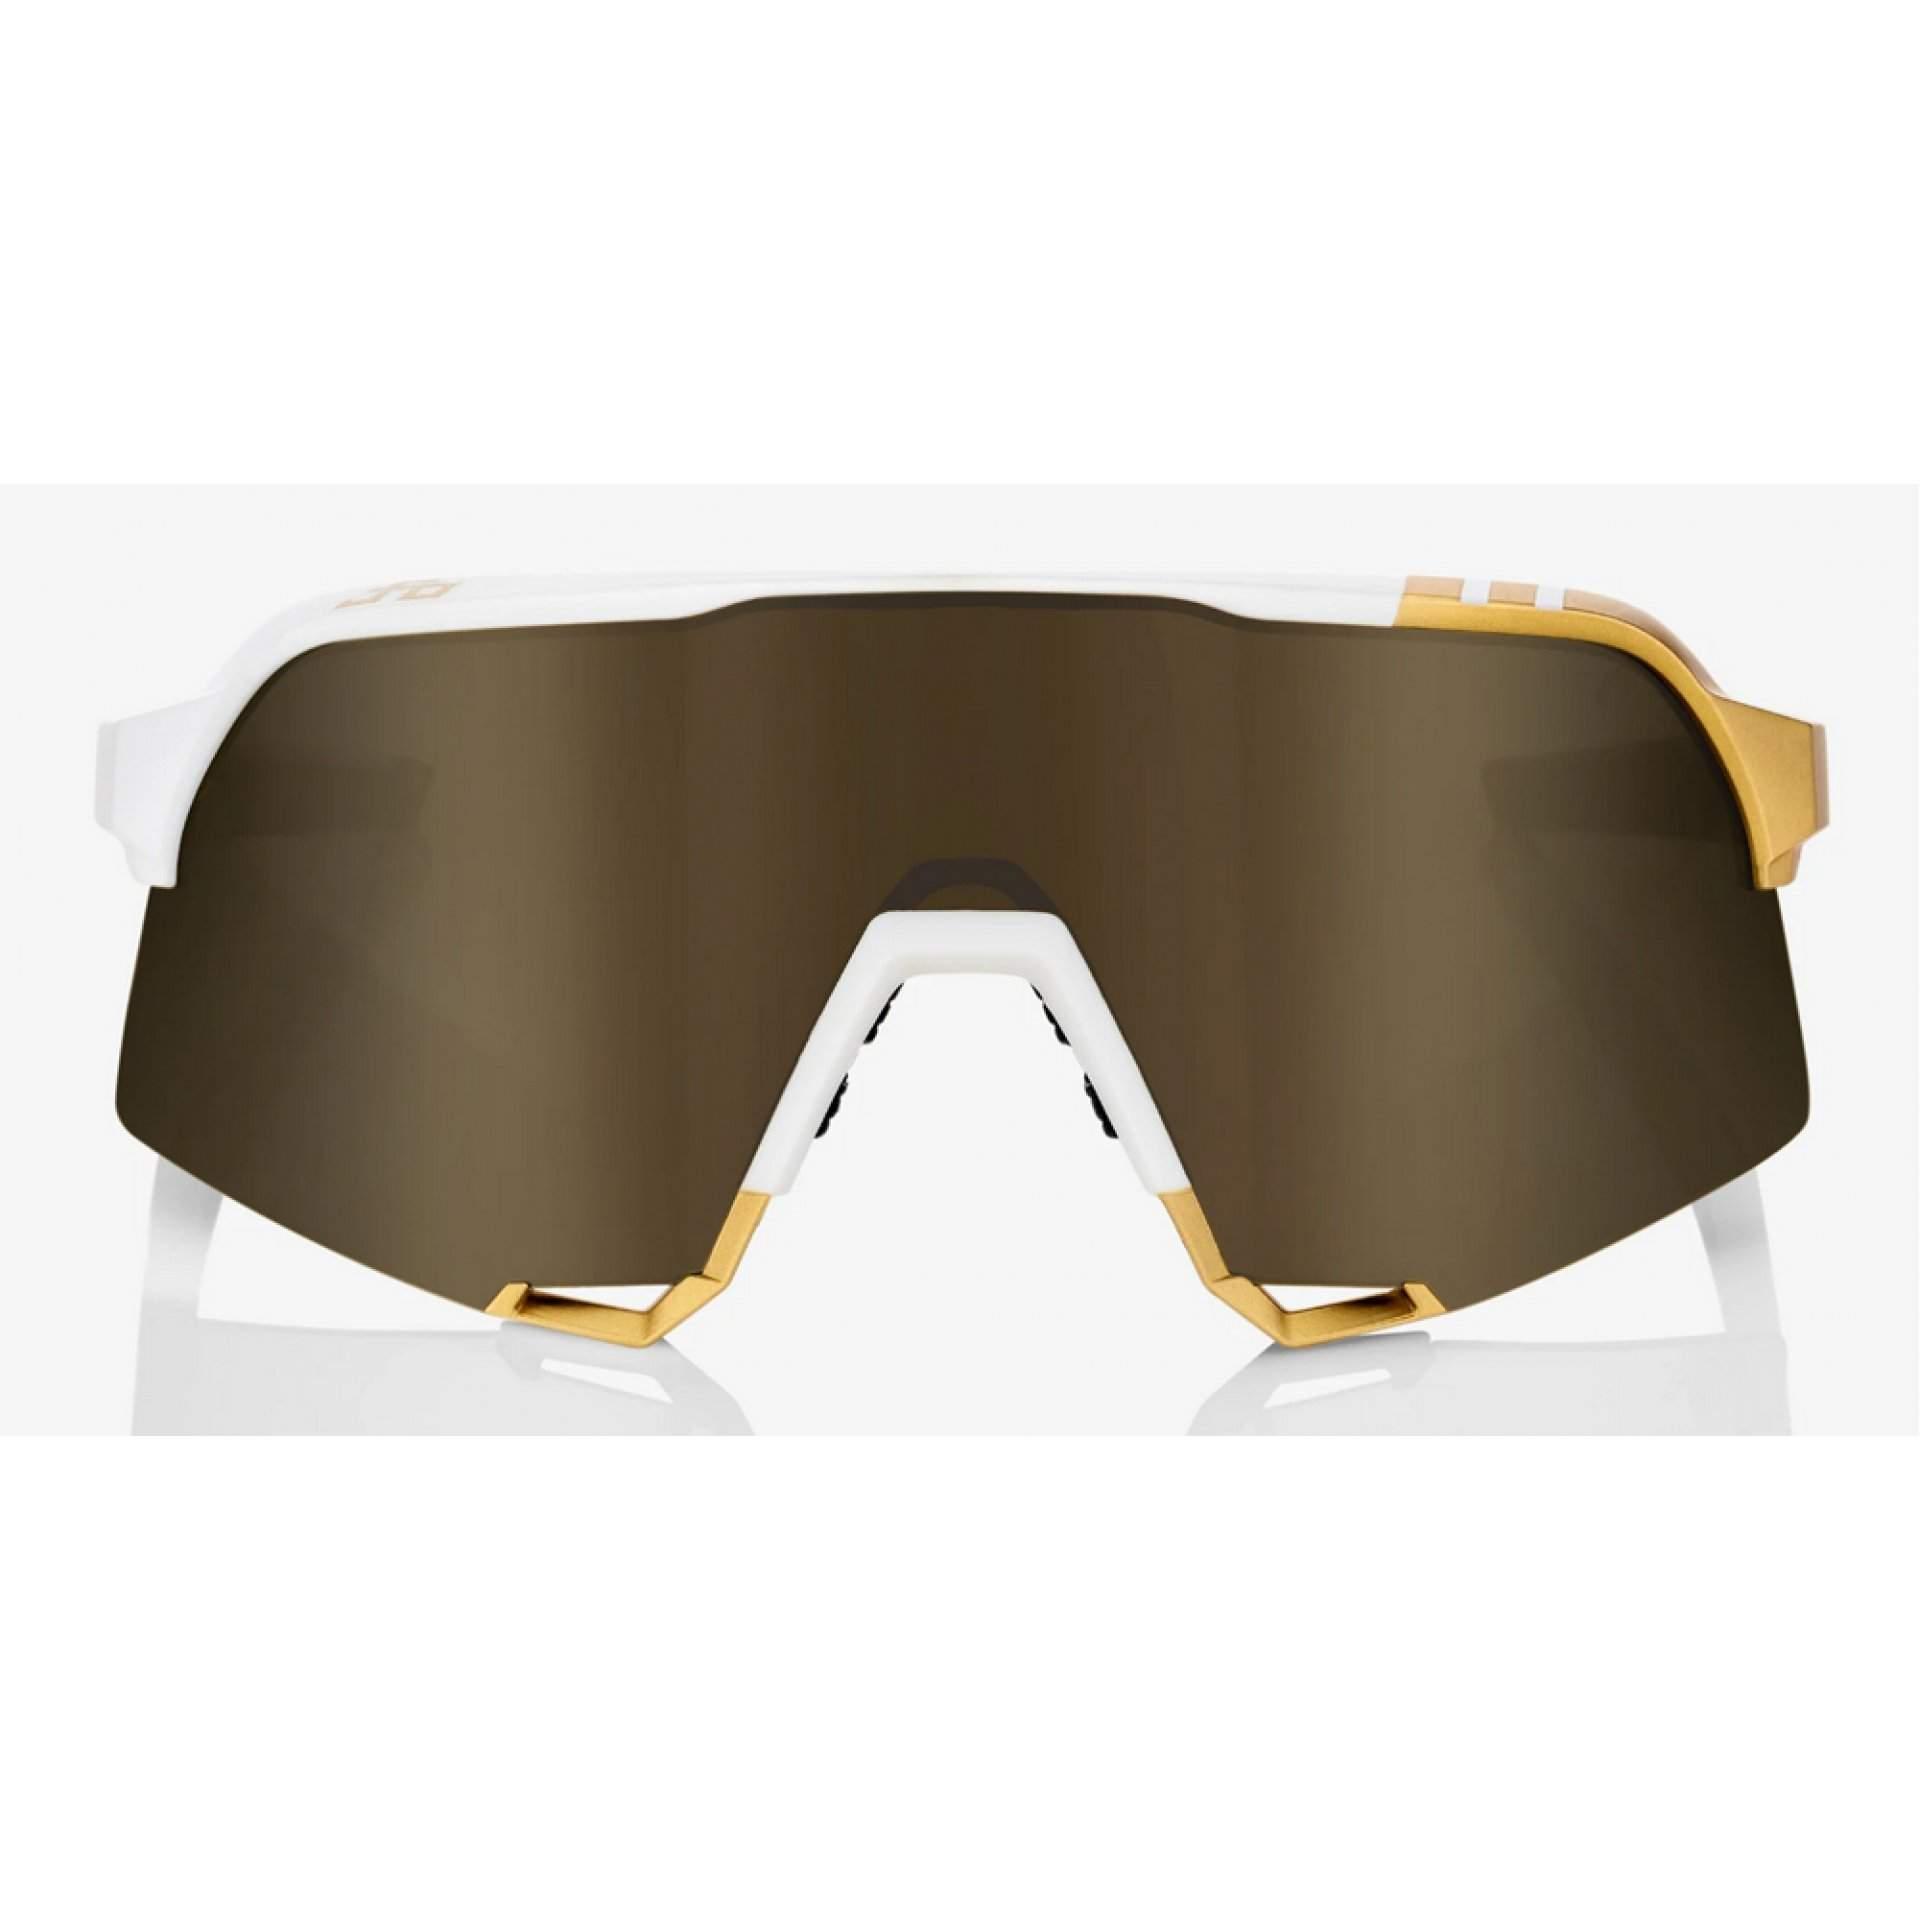 OKULARY 100% PETER SAGAN LE S3 WHITE GOLD|SOFT GOLD MIRROR 2